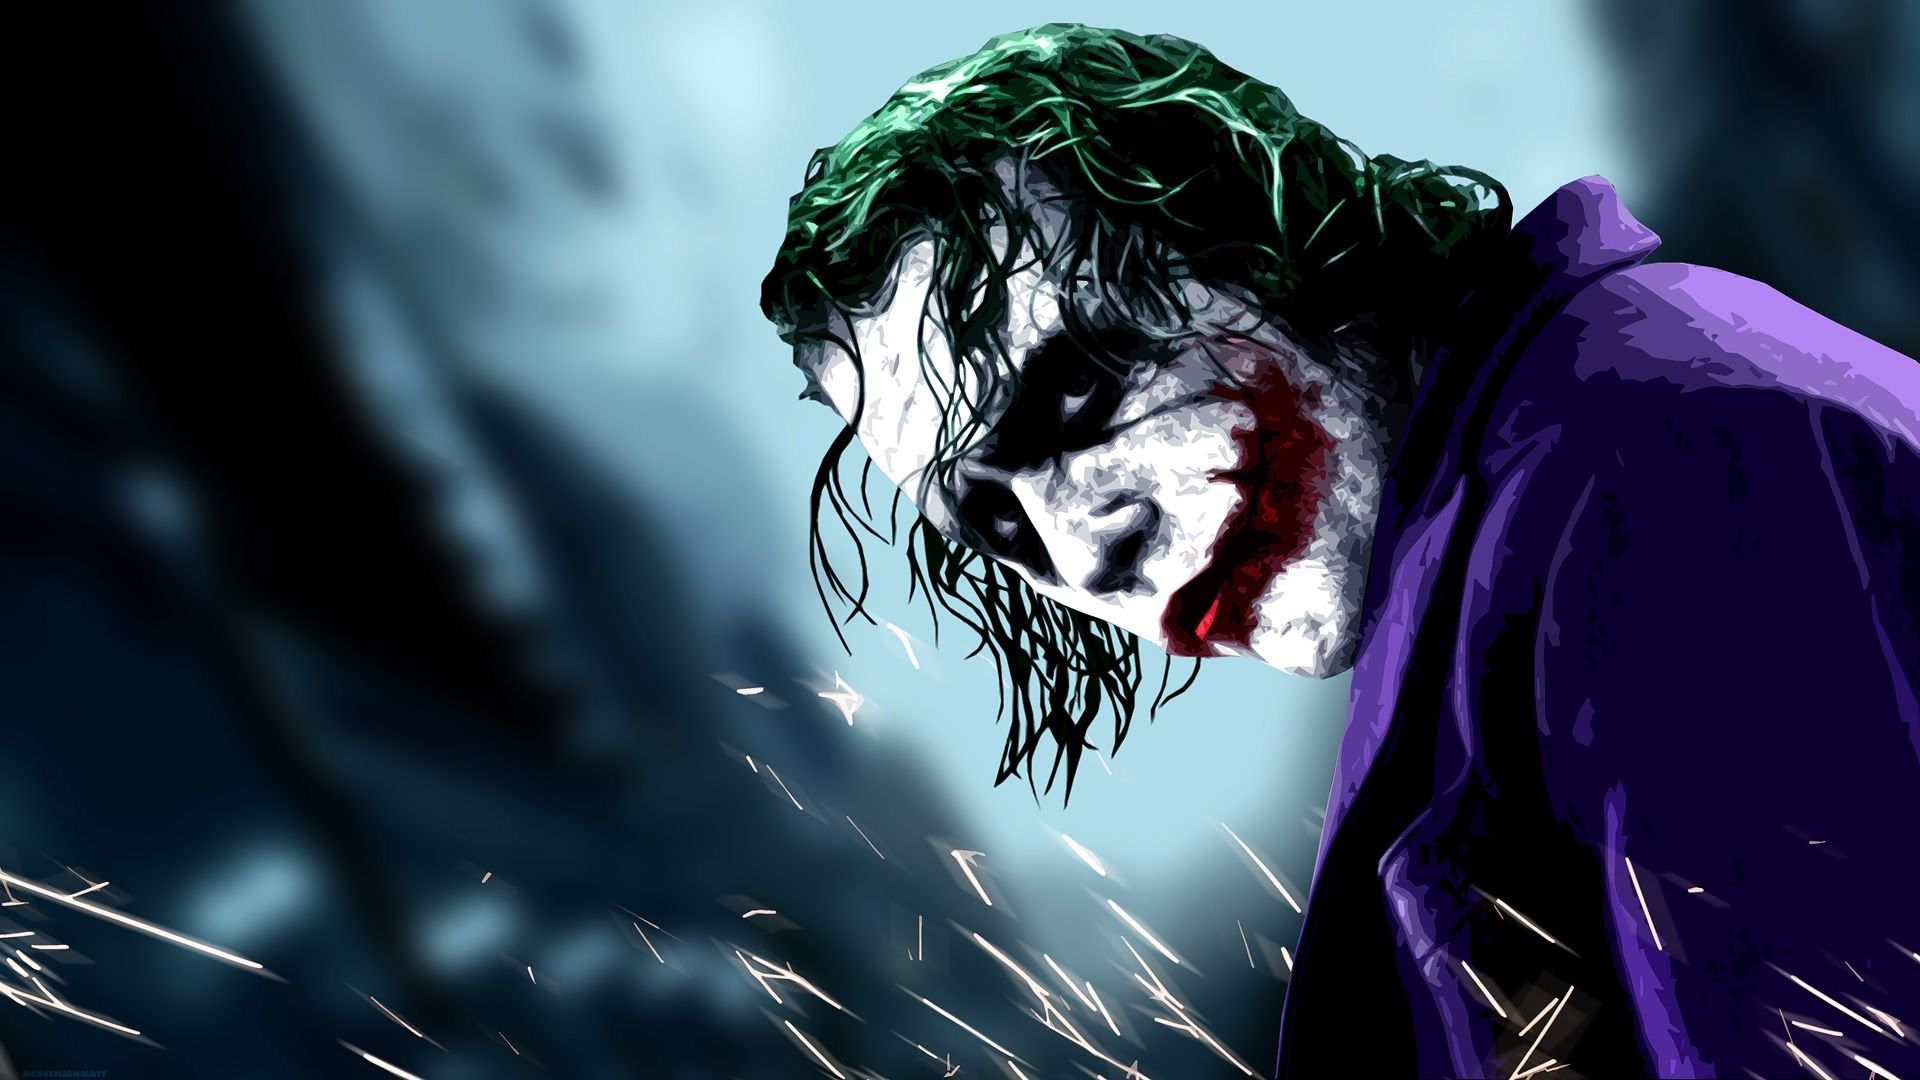 joker theme background images Joker wallpapers Joker hd 1920x1080